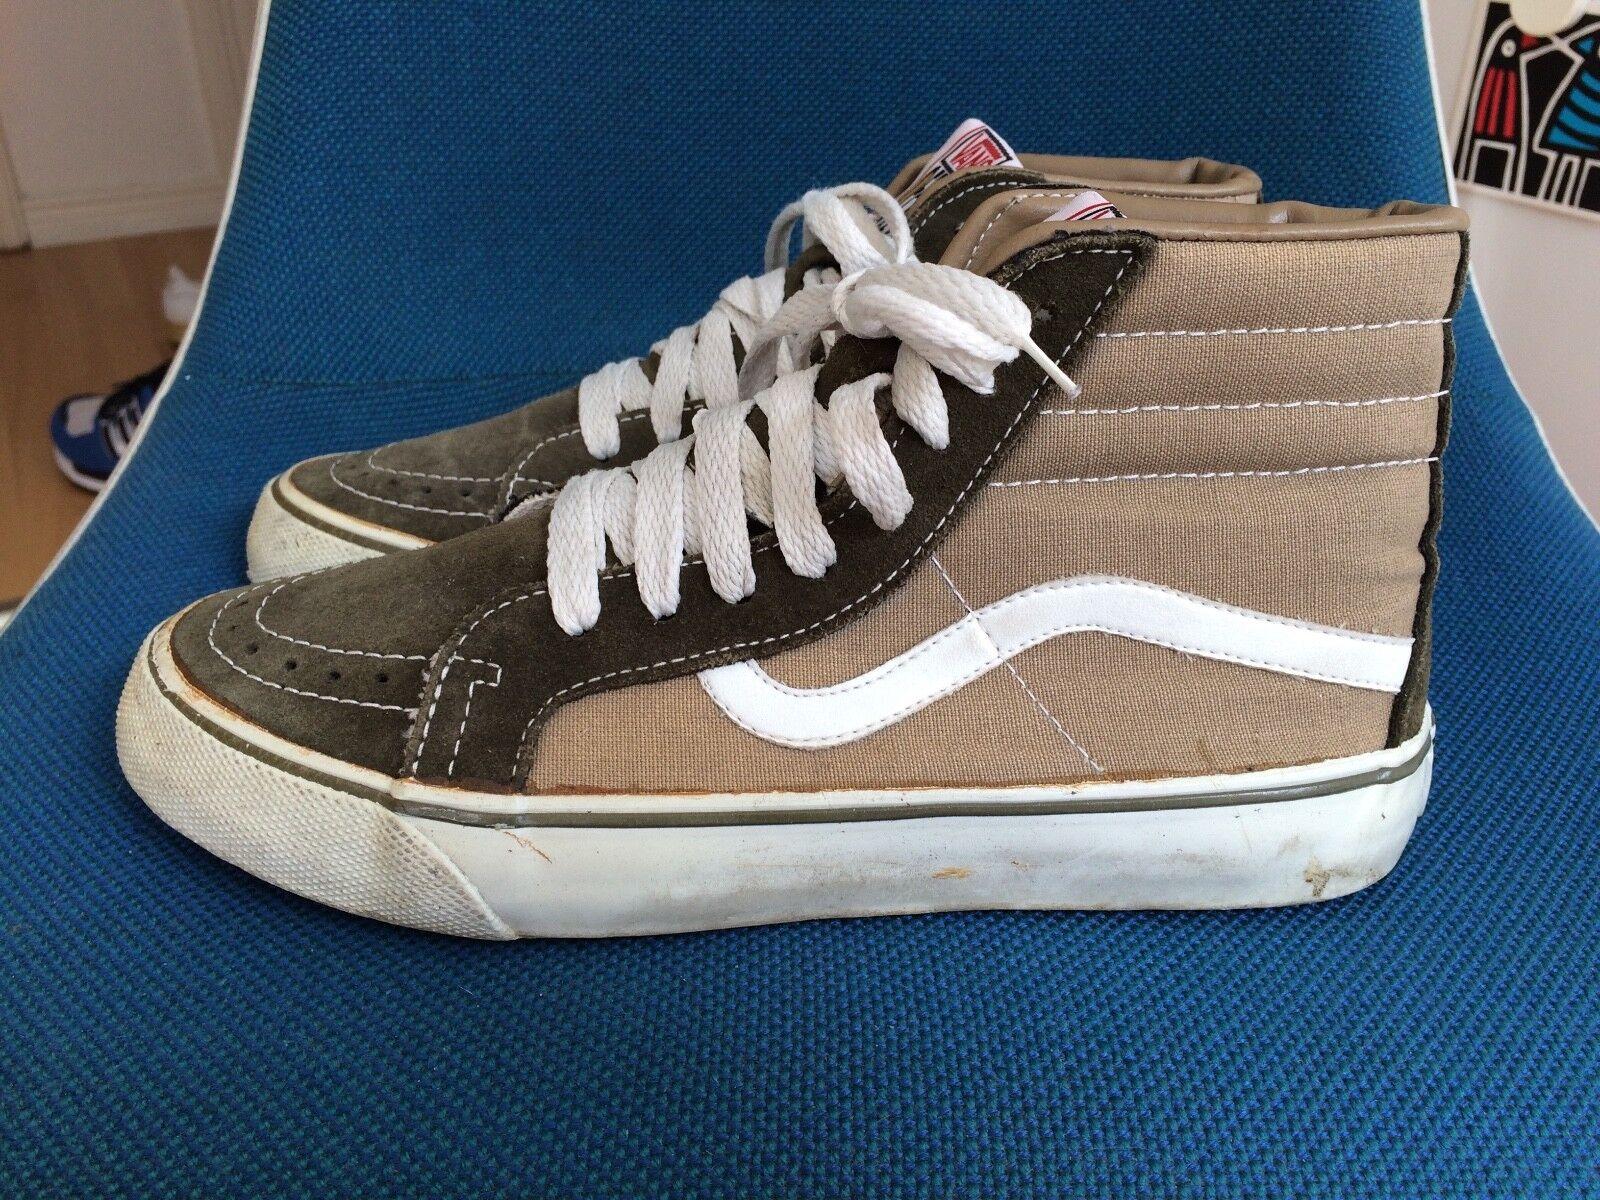 Vintage VANS Sneakers 80s Gr. 7 Off the Wall retro Skateboarding old skool no retro Wall 6e8732